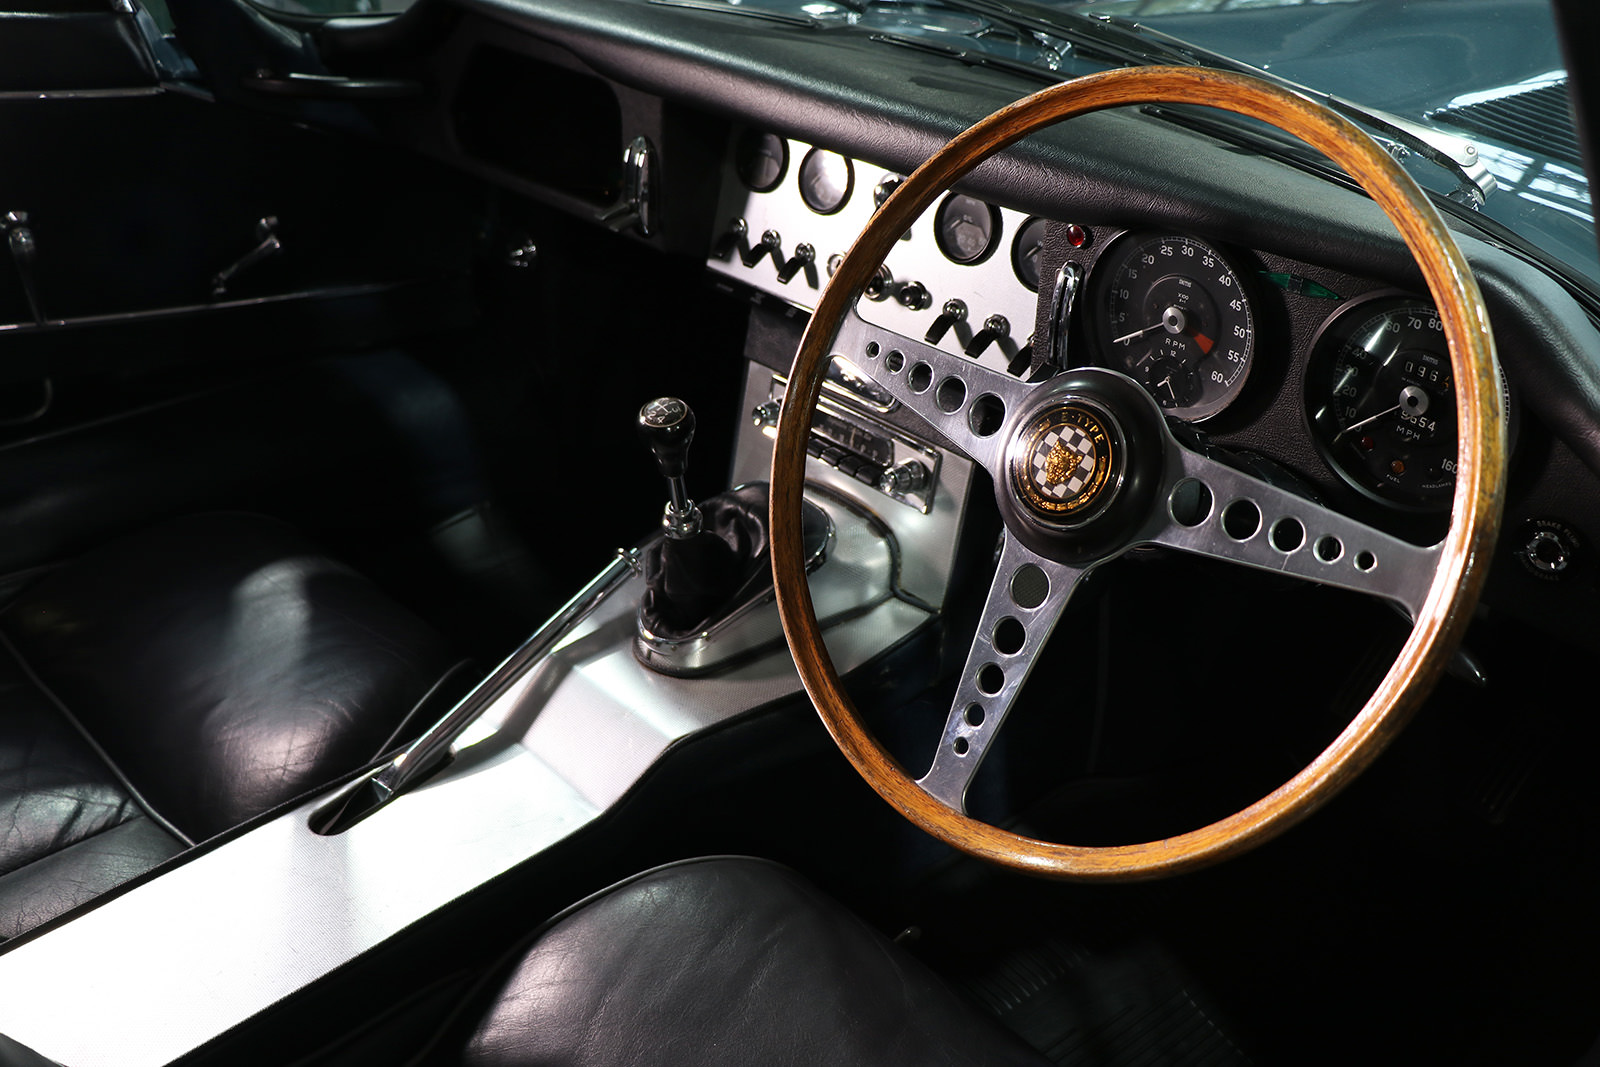 1963_cotswold_blue_series 1_jaguar_etype_sayer_selection_wilkinson_web_20.jpg